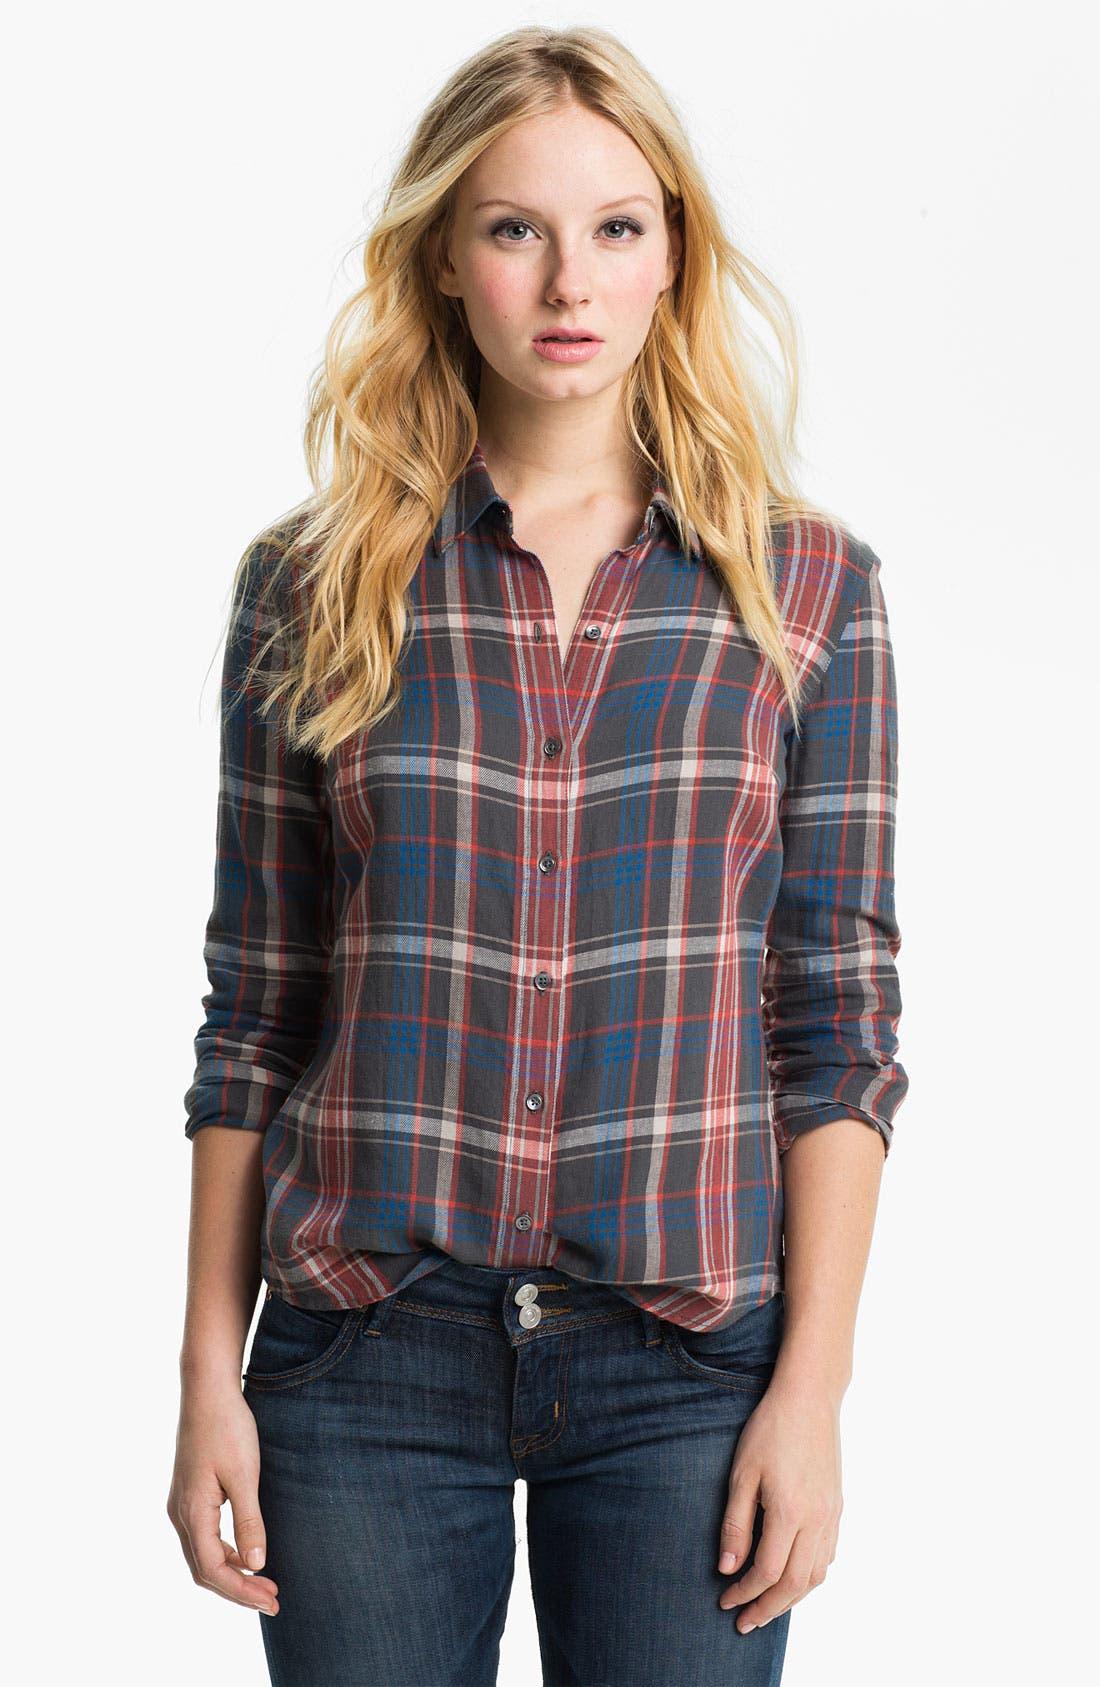 Alternate Image 1 Selected - James Perse 'Harbor' Plaid Shirt